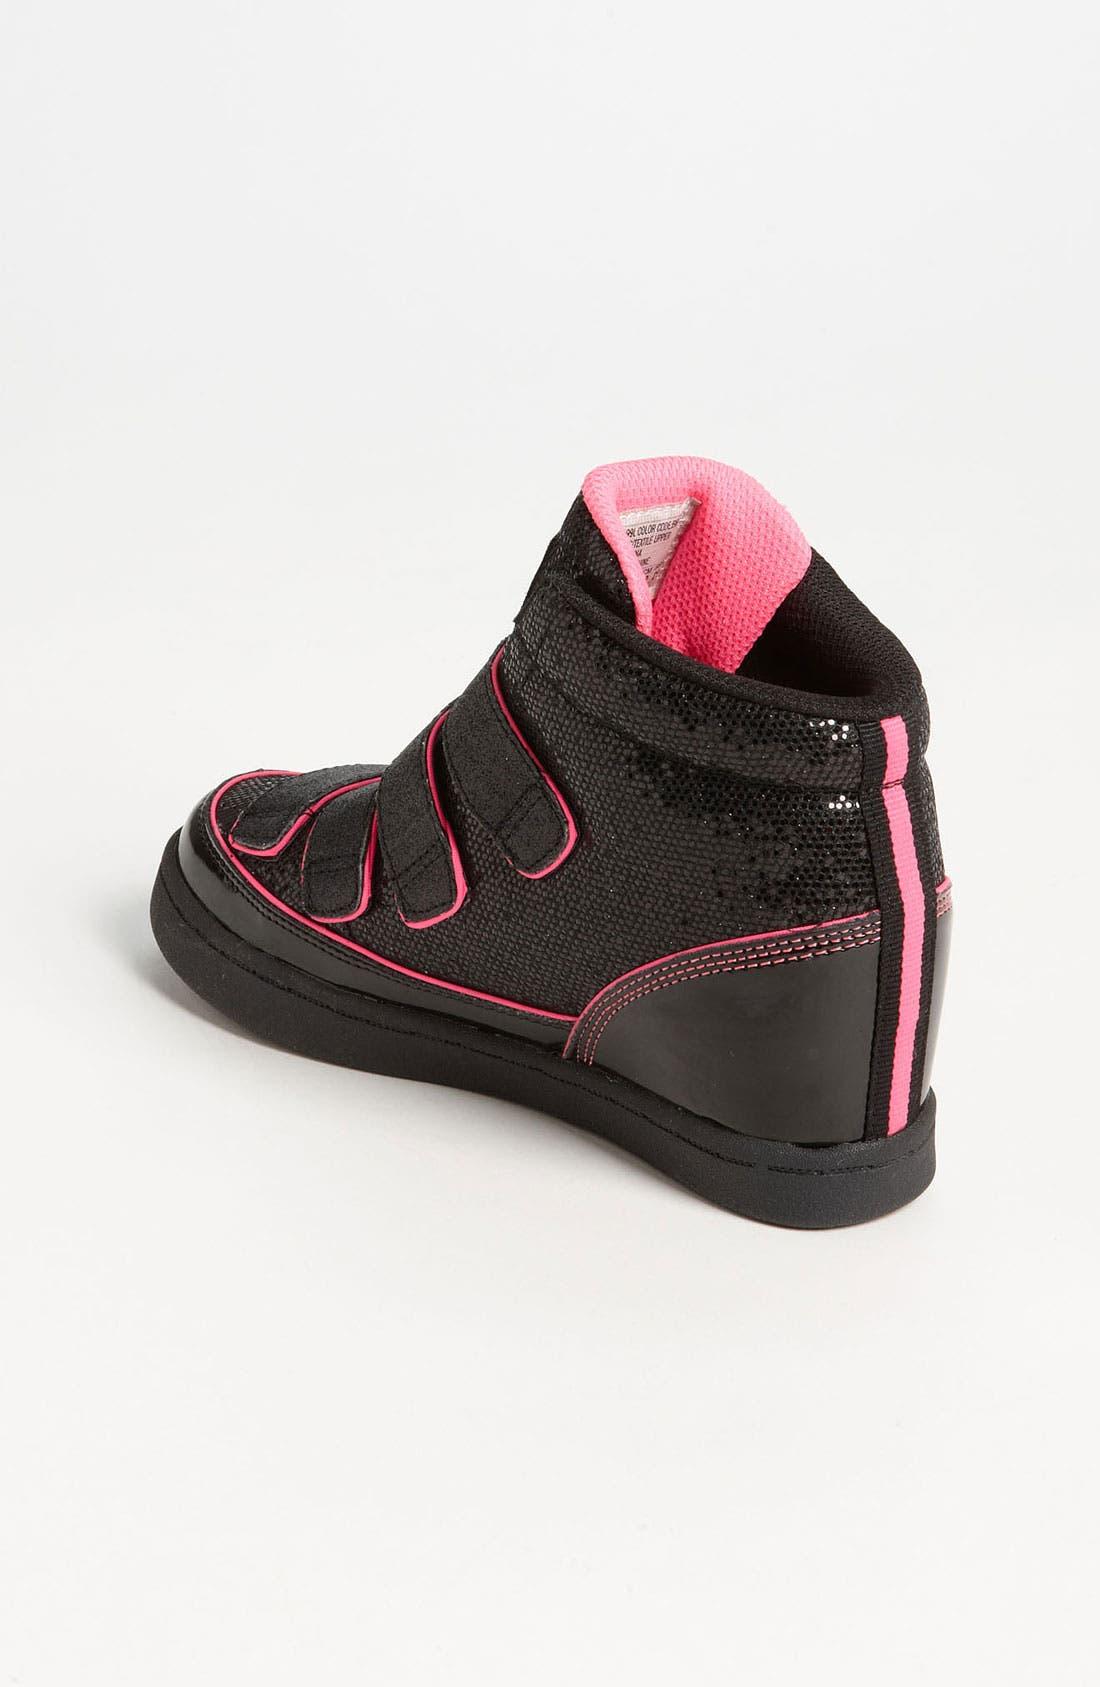 Alternate Image 2  - SKECHERS '4 Upz' Sneaker (Toddler, Little Kid & Big Kid)